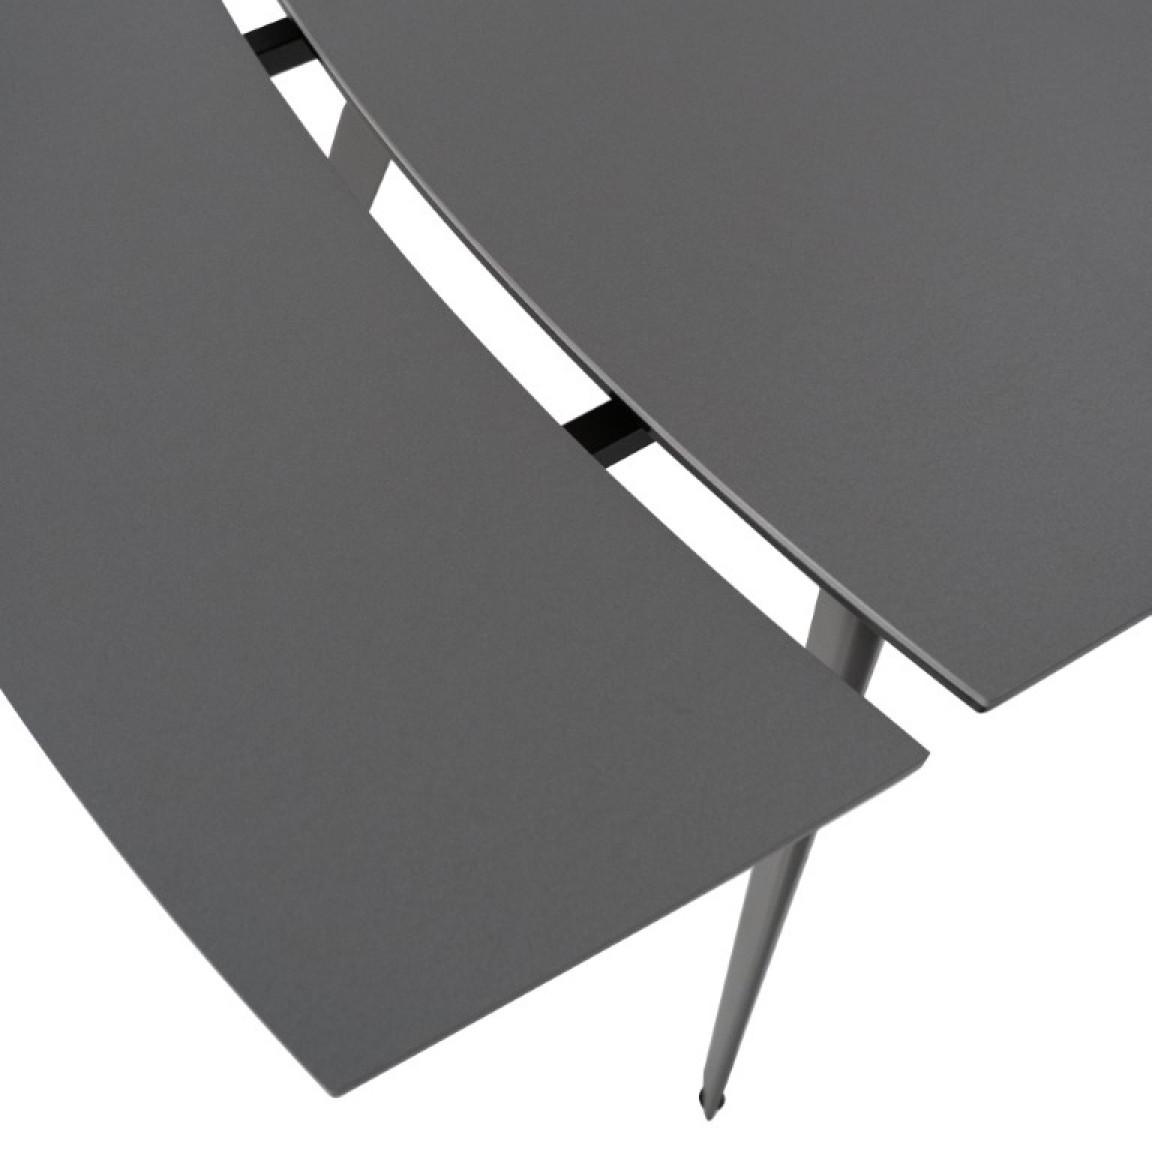 Verlängerbarer Tisch 140 / 170 / 200 cm   Grau